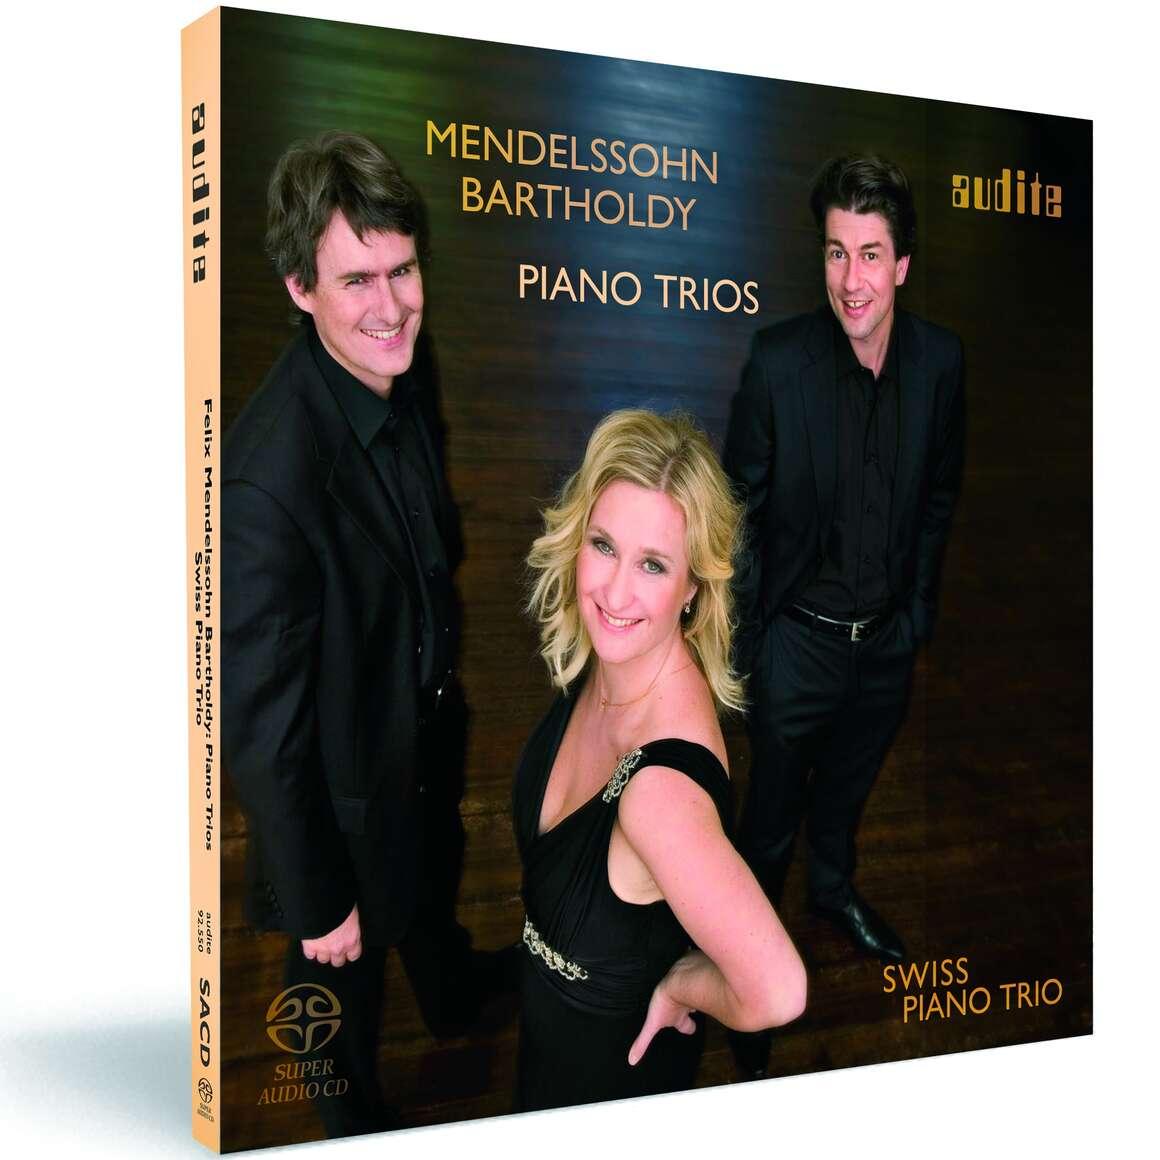 F. Mendelssohn Bartholdy: Piano Trios